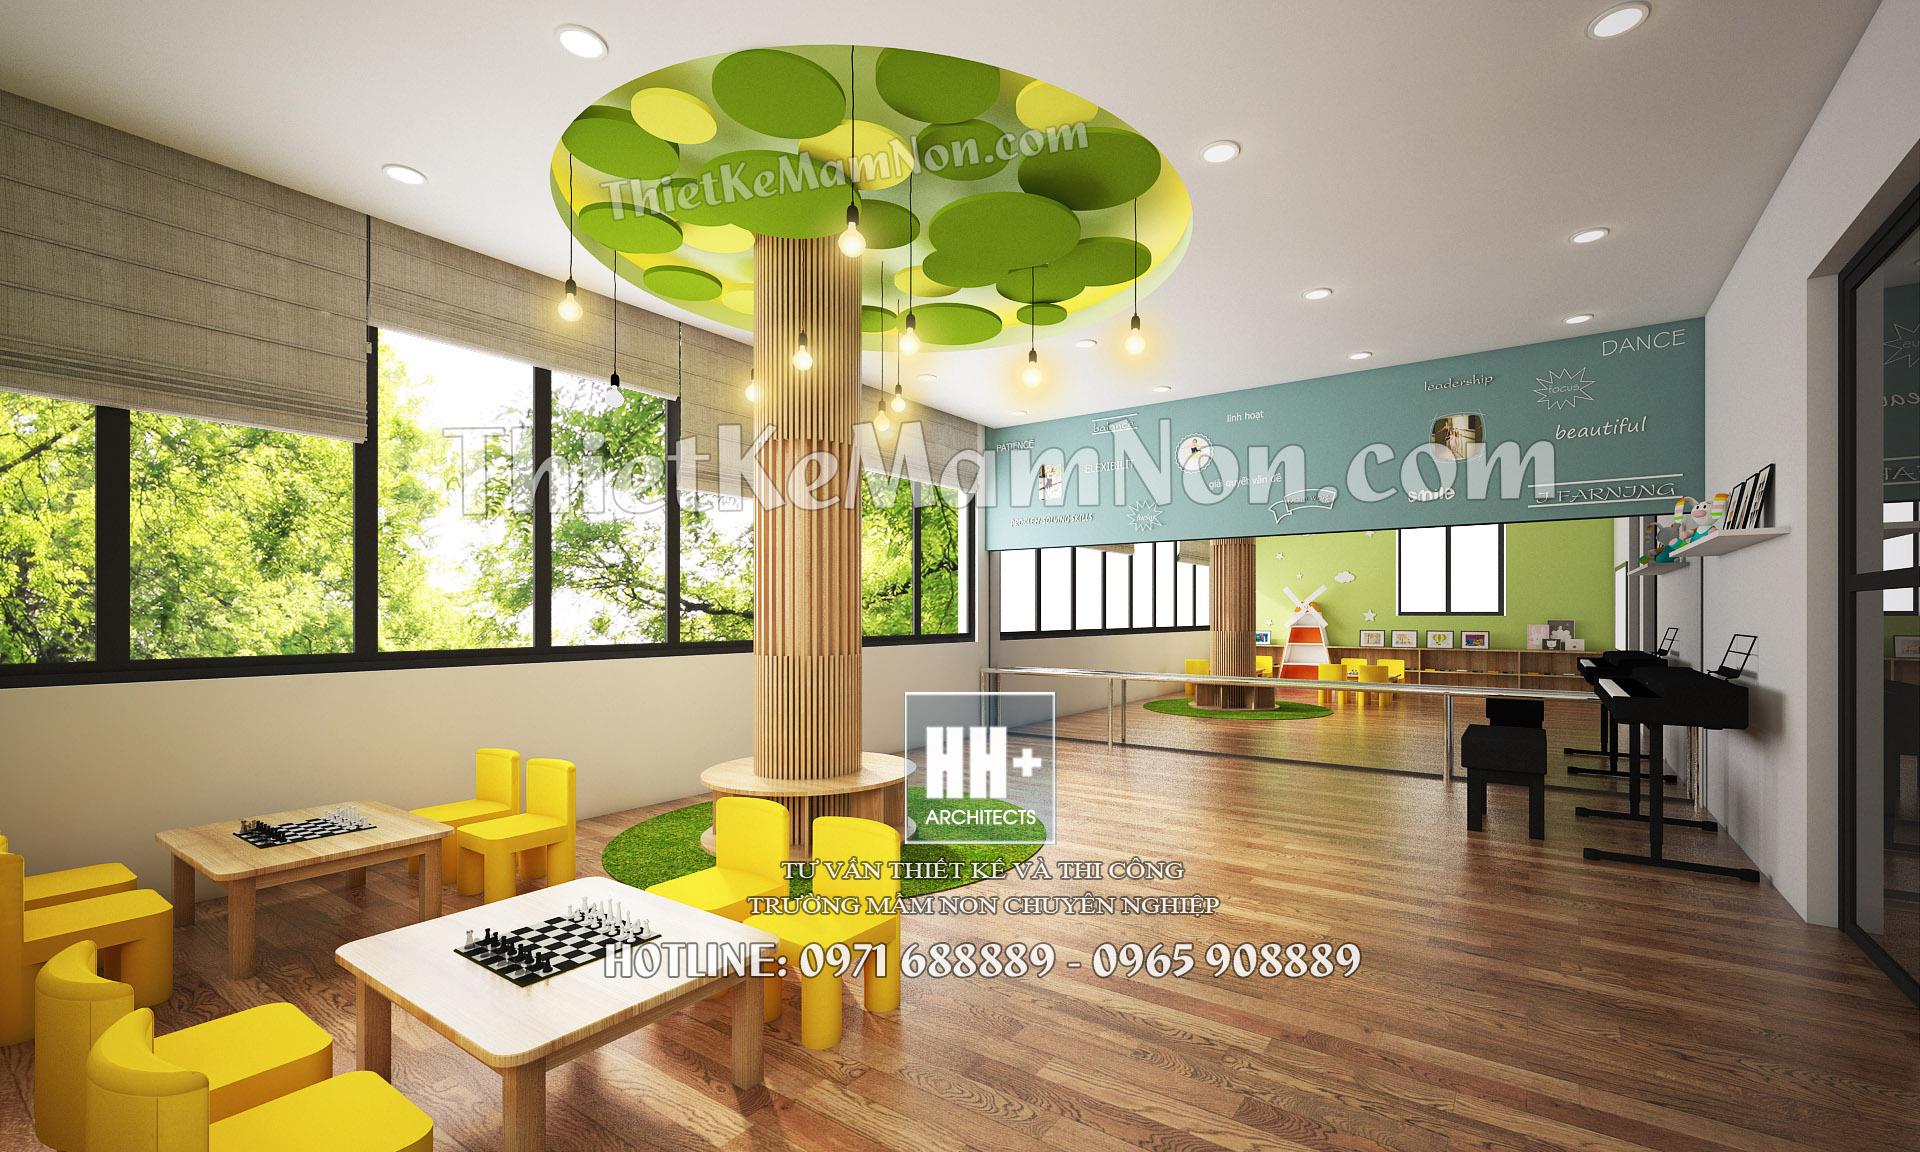 05 thiết kế nội thất mầm non Thiết kế nội thất mầm non quốc tế Việt Anh 05